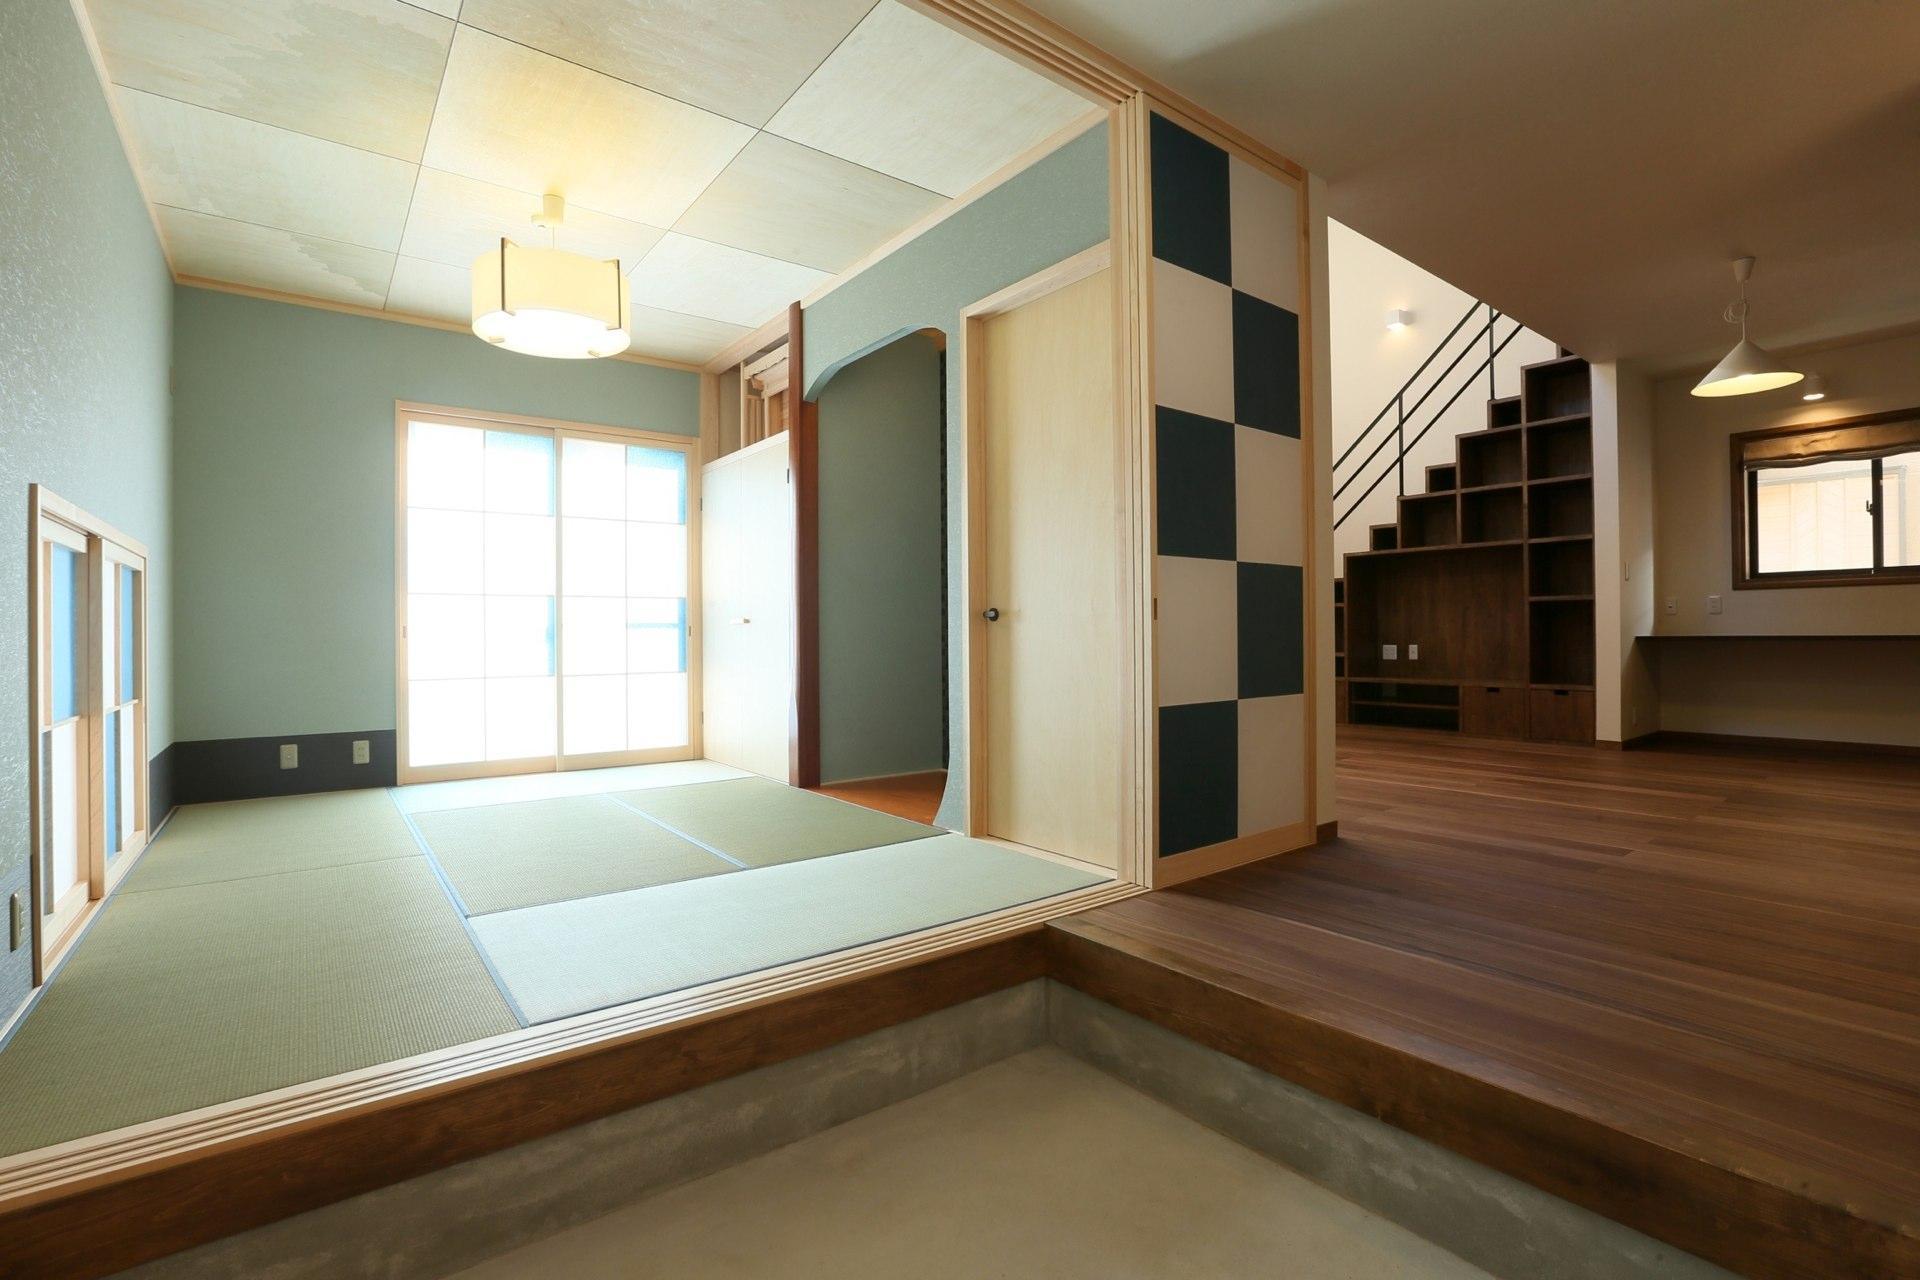 K's residenceの部屋 玄関土間と一体になる和室